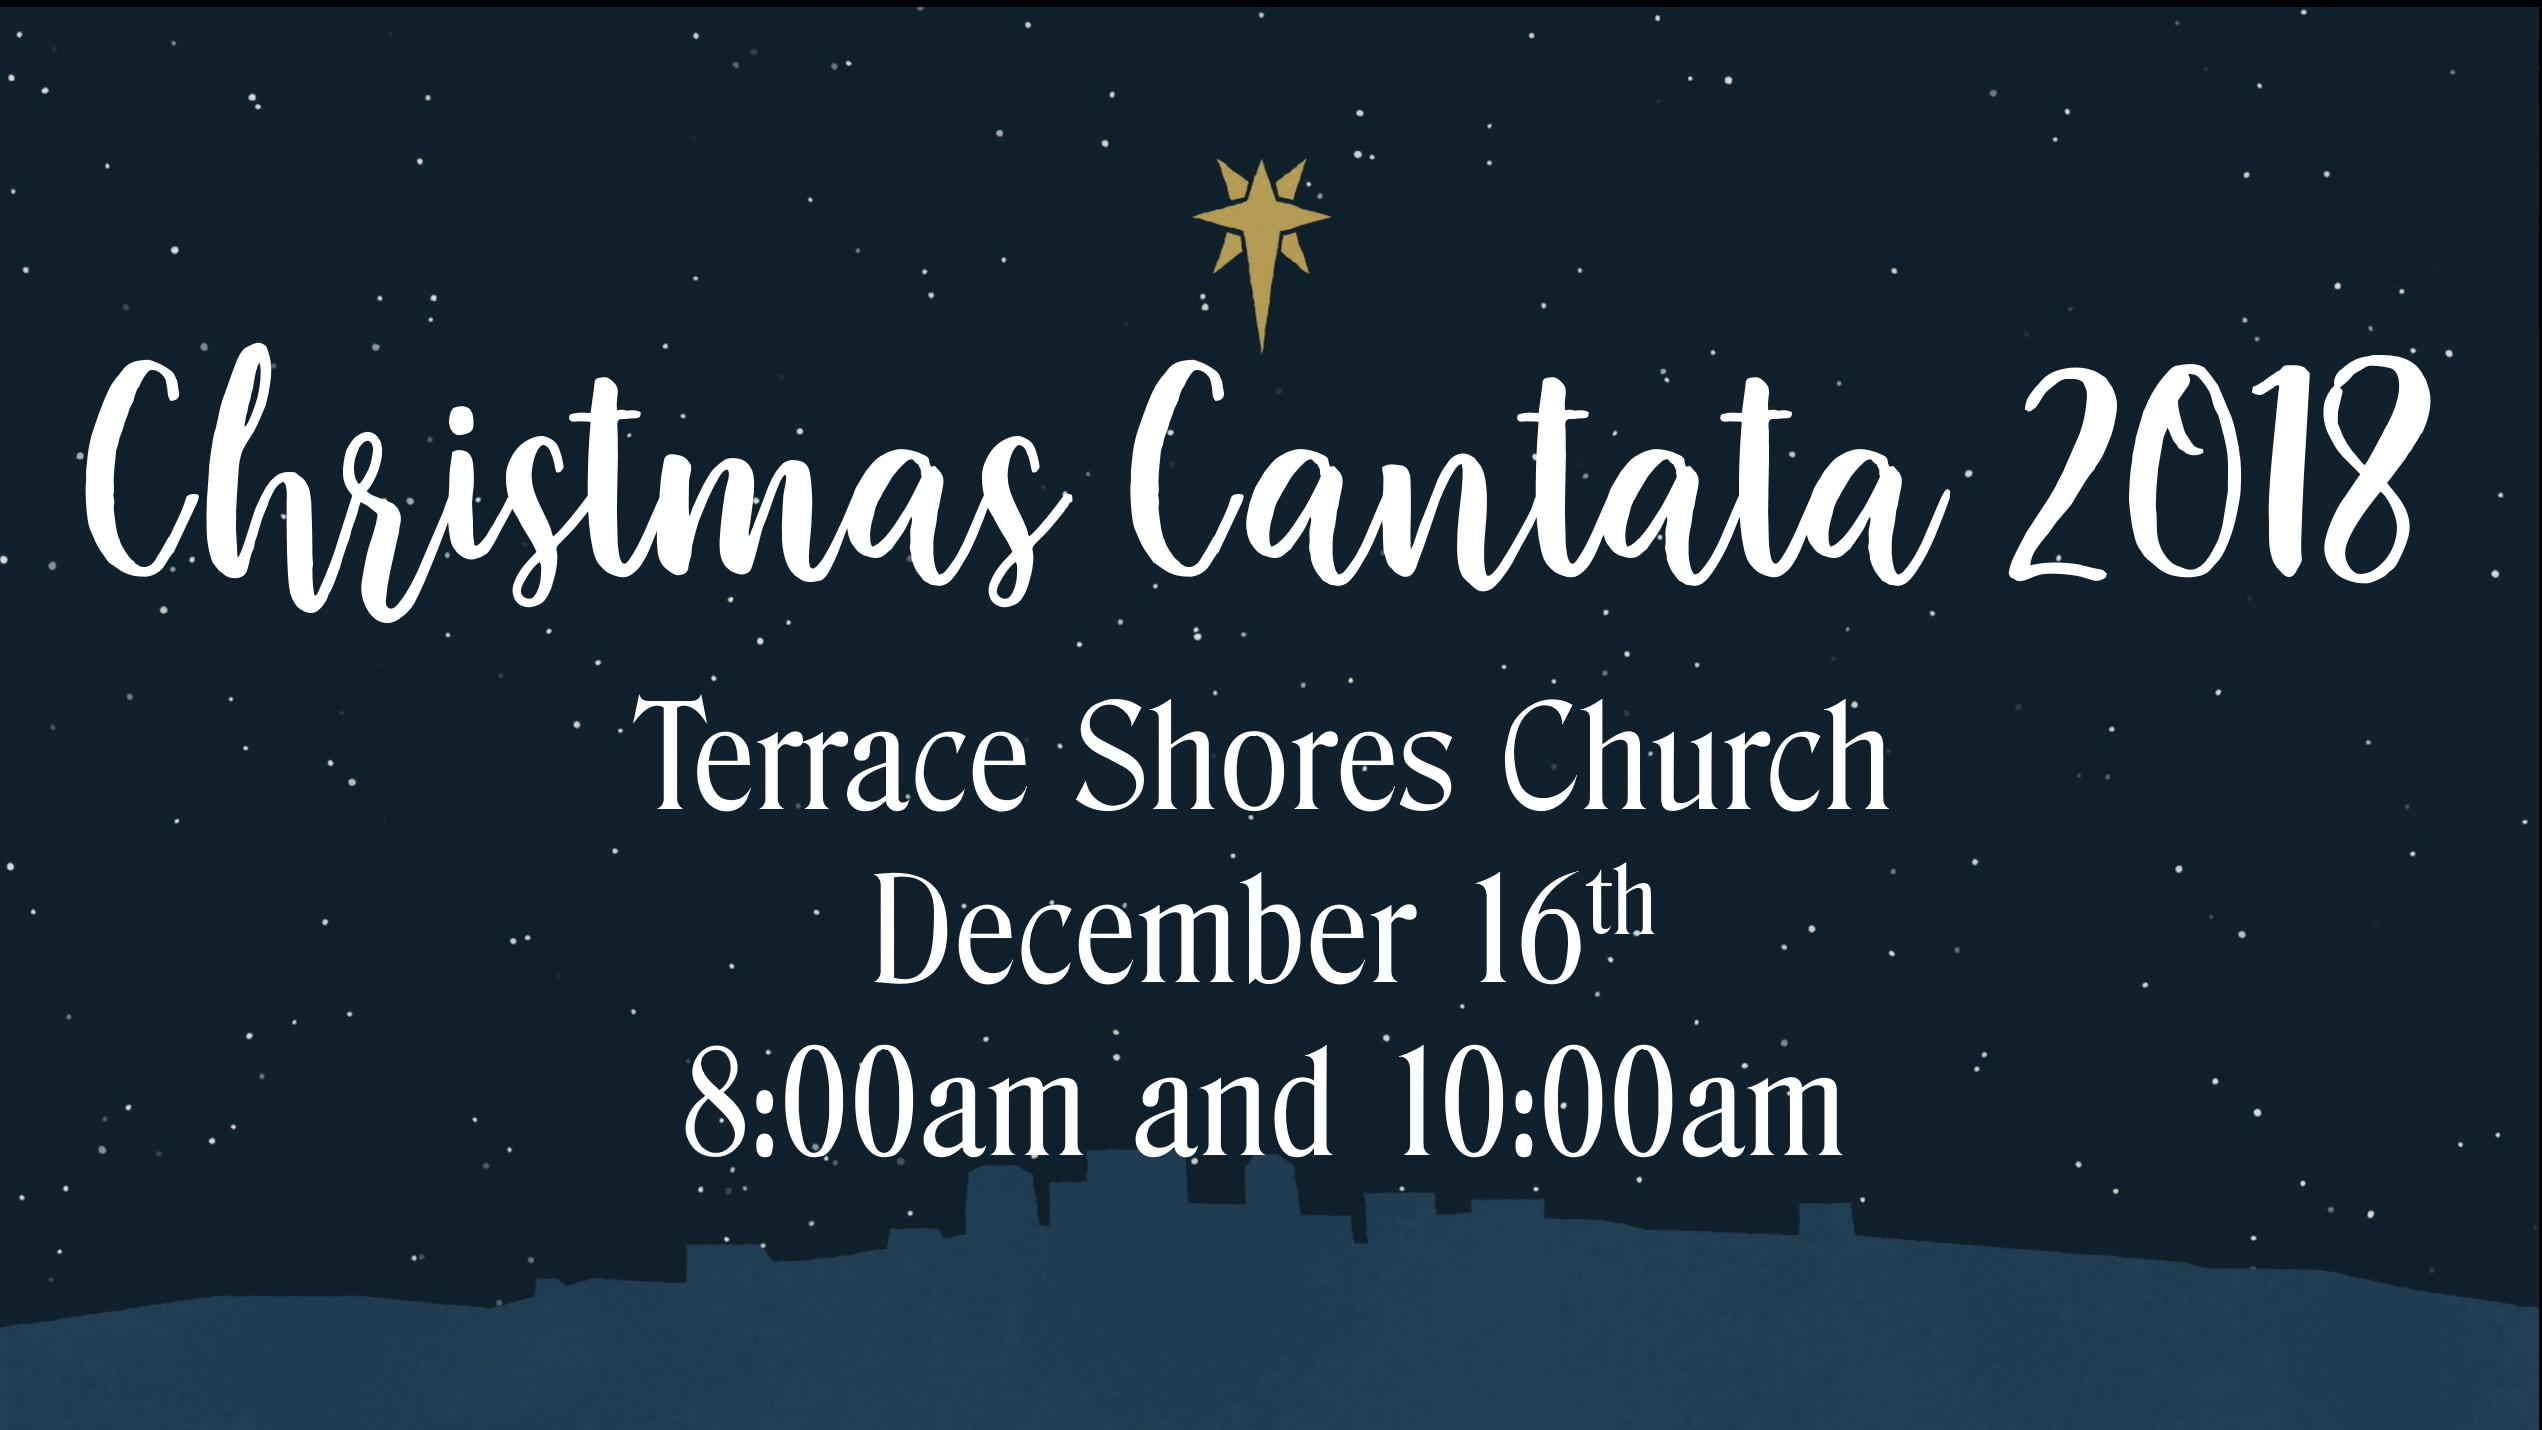 Christmas Cantata.Christmas Cantata 2018terrace Shores Church Where Friends